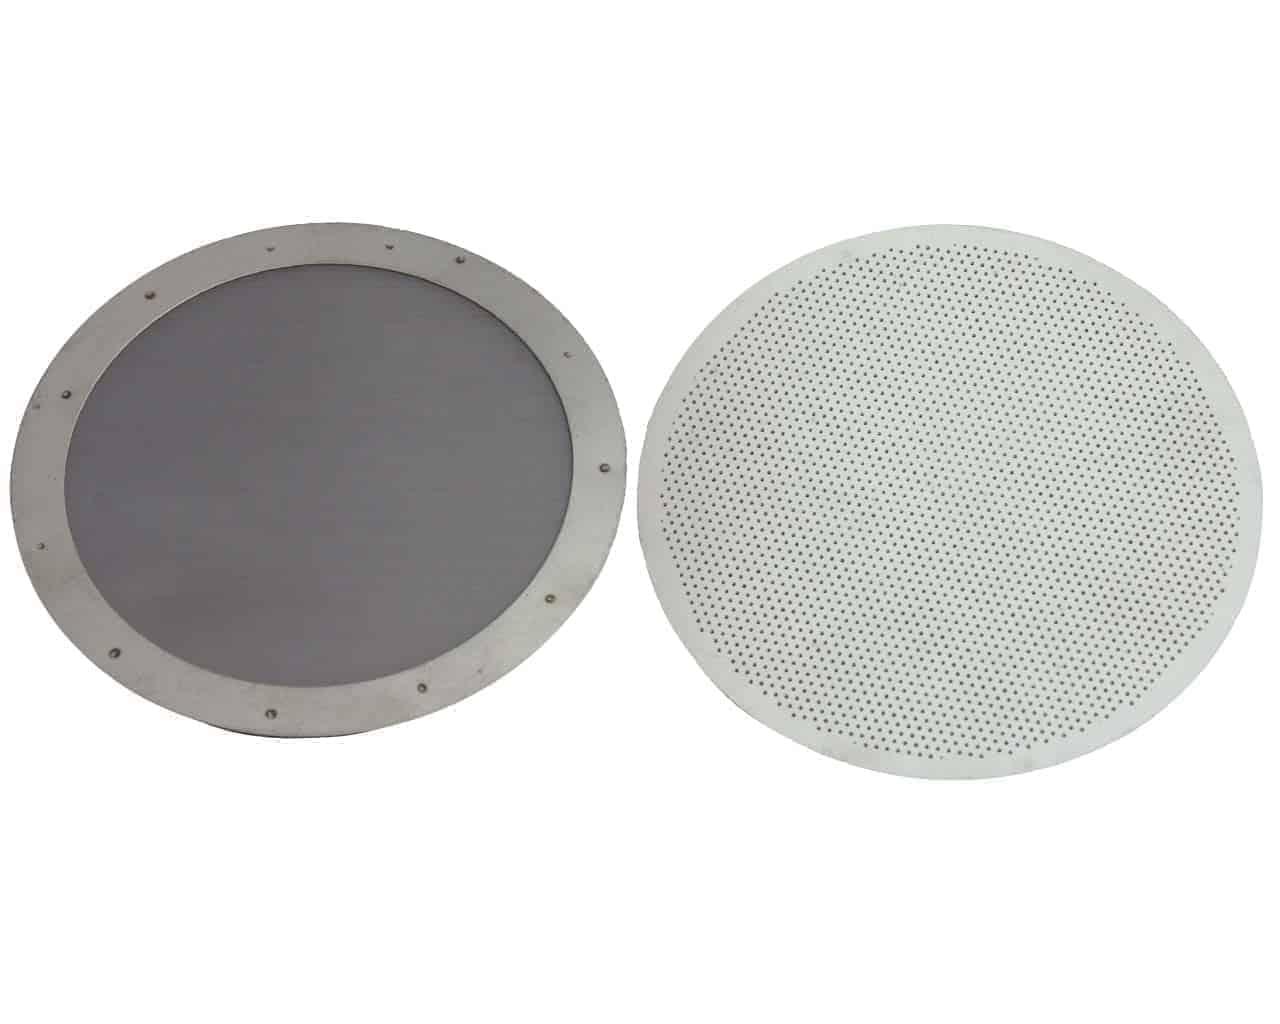 Aeropress reusable stainless steel filter disc pack